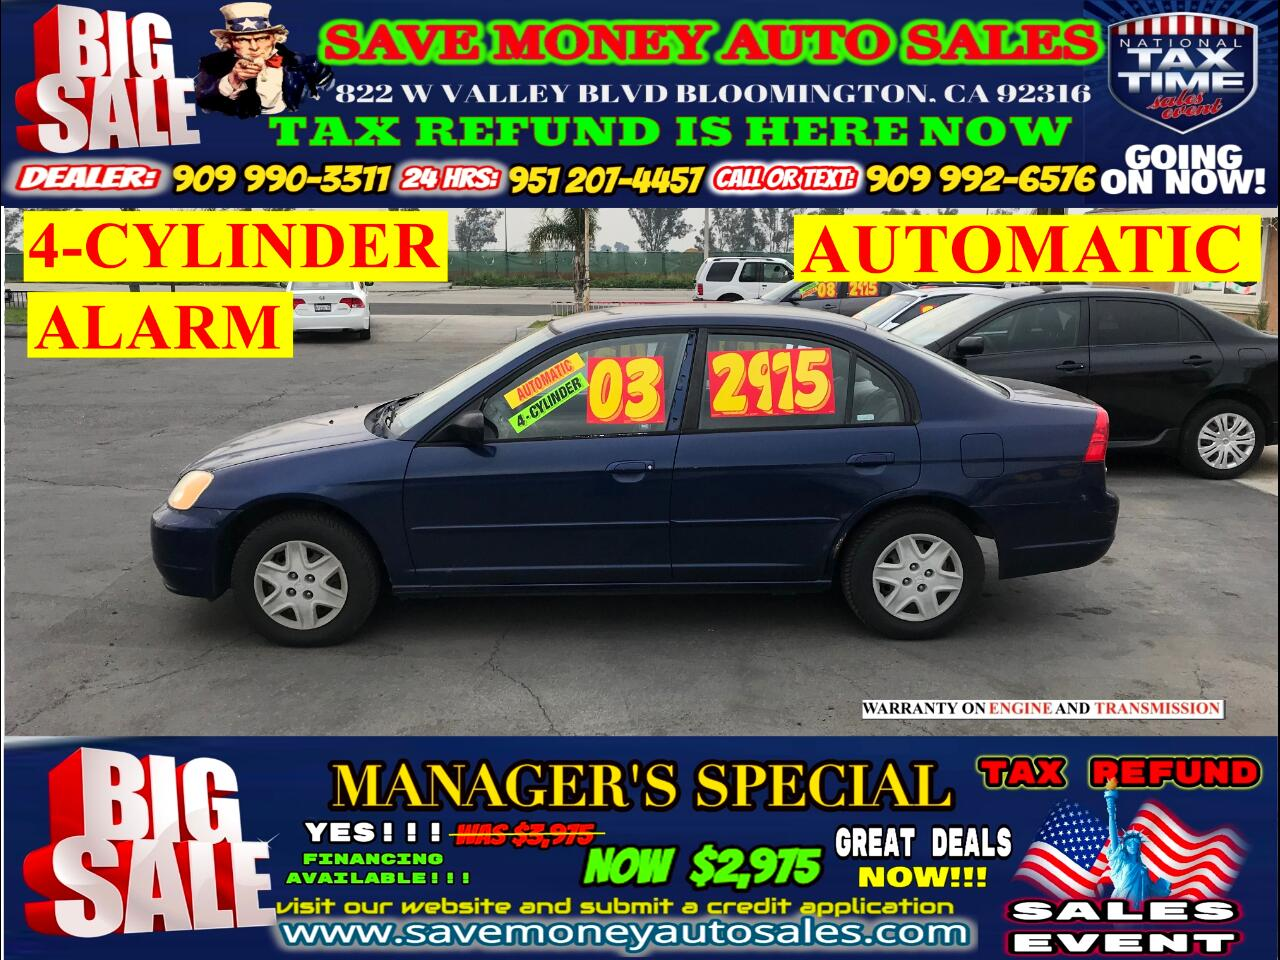 2003 Honda Civic LX SEDAN >>>4 CYLINDERS,AUTOMATIC>>MANAGER'S SPECI